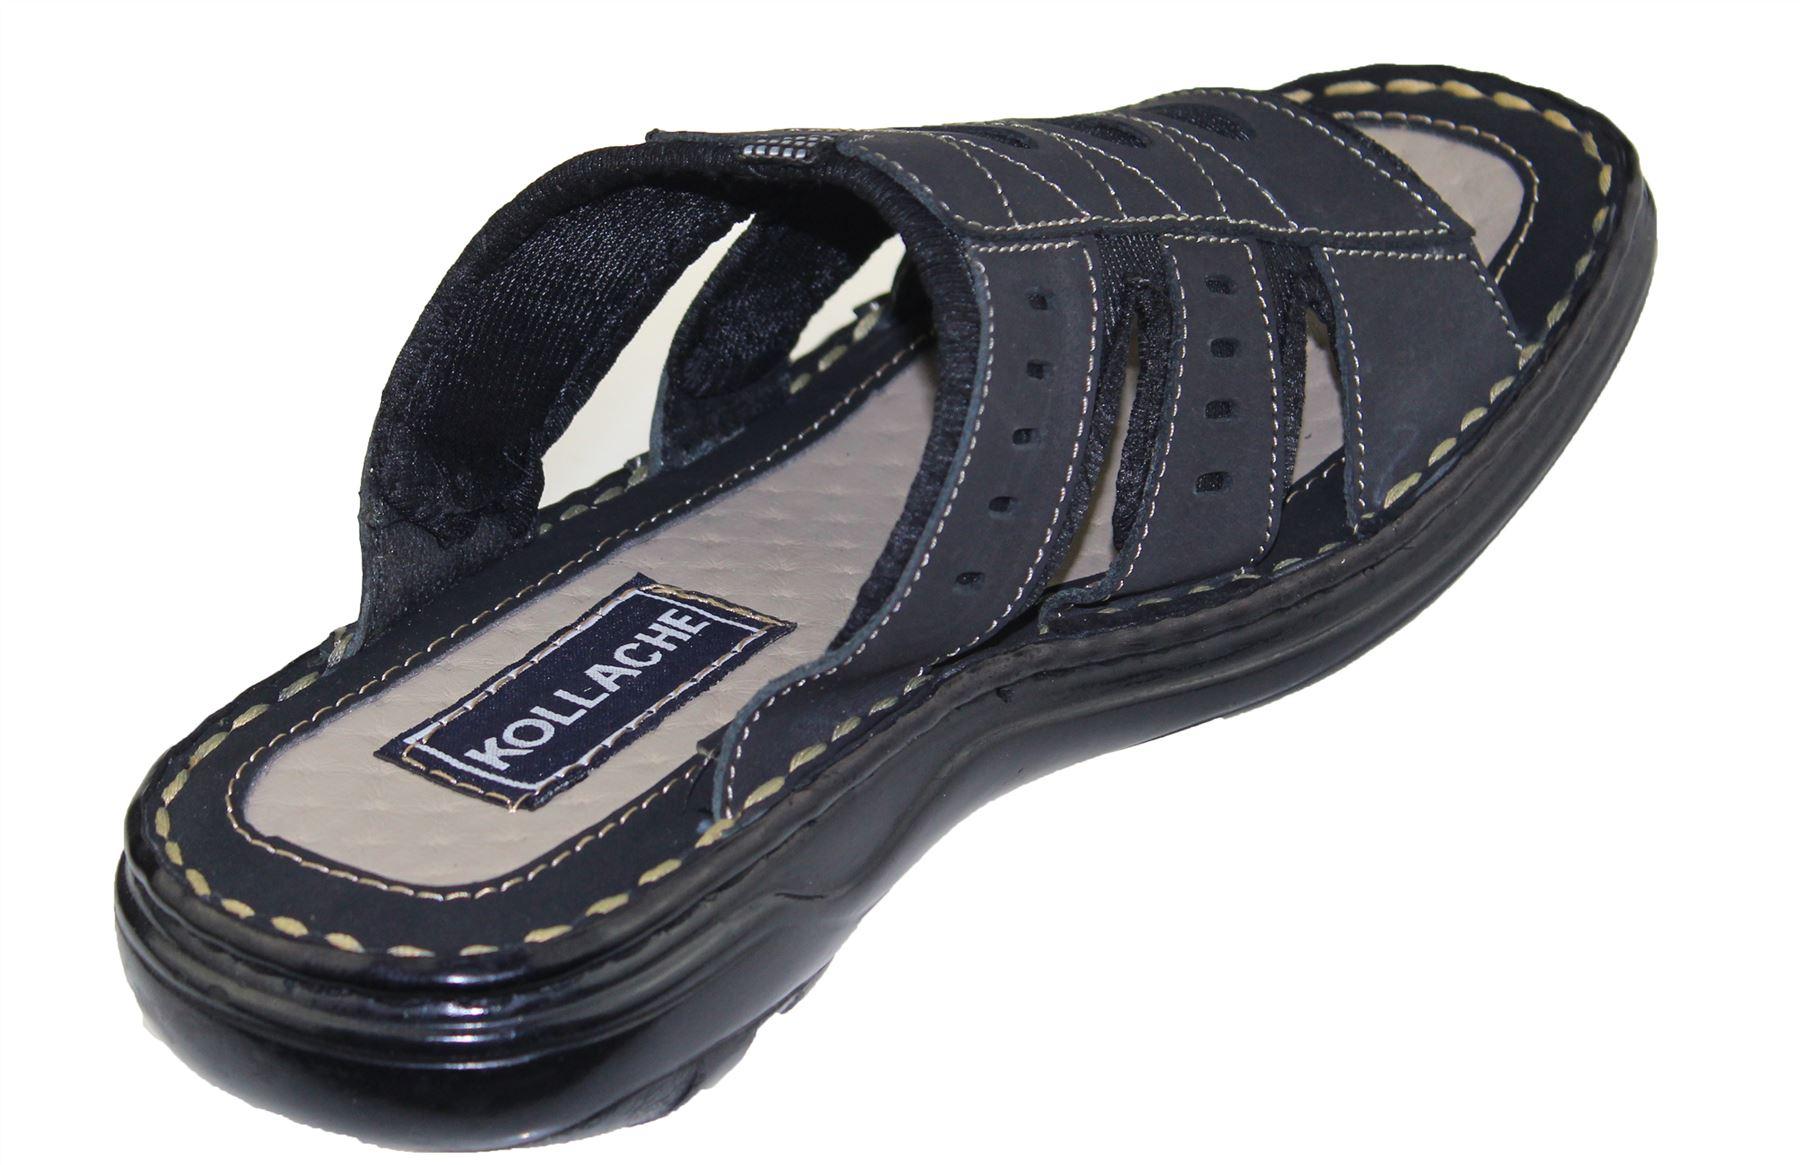 Mens-Slipper-Sandal-Sports-Beach-Buckle-Walking-Fashion-Summer-Casual-Shoes-Size miniatura 19